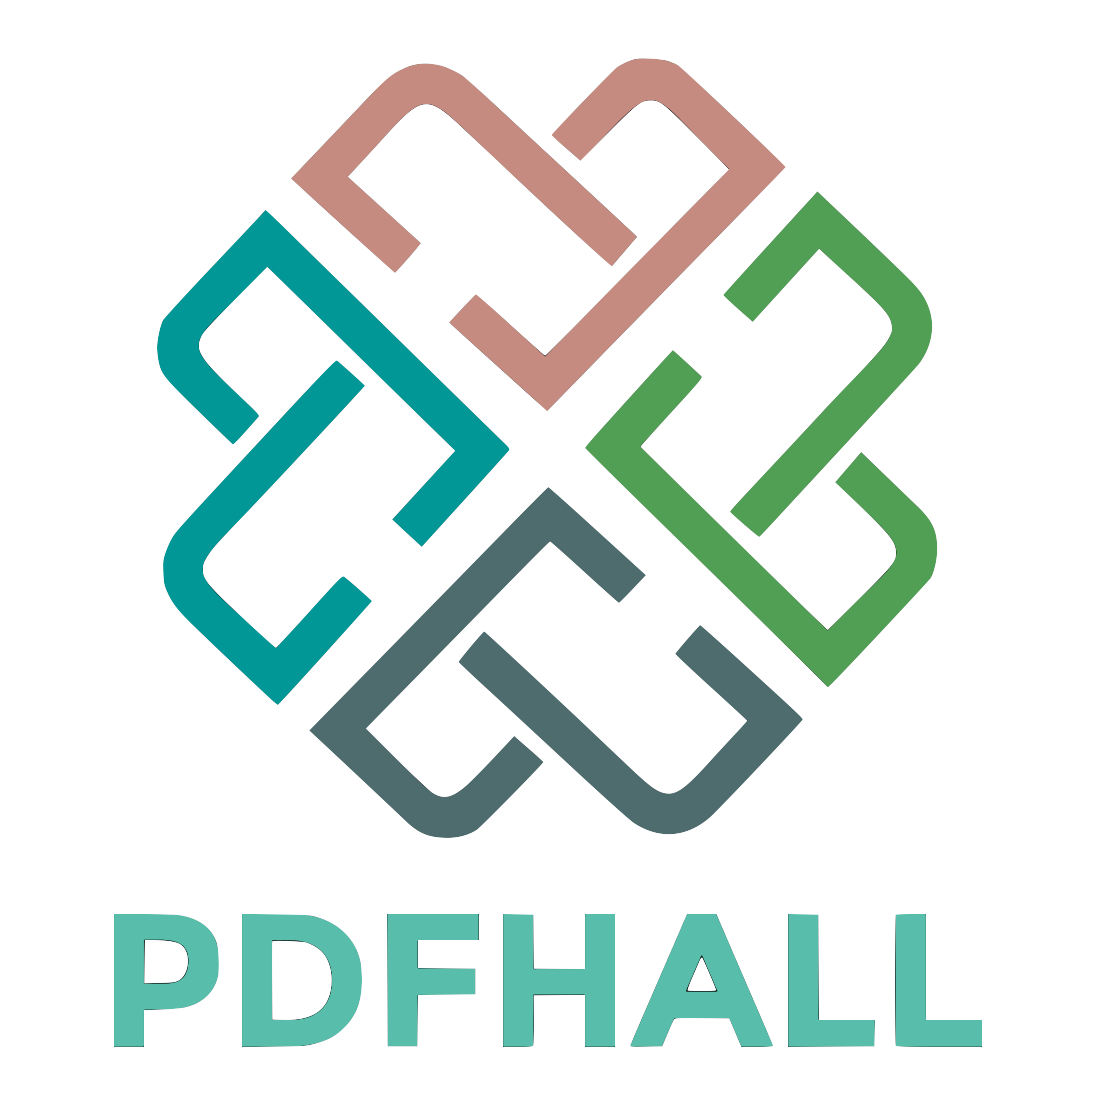 pdfhall logo